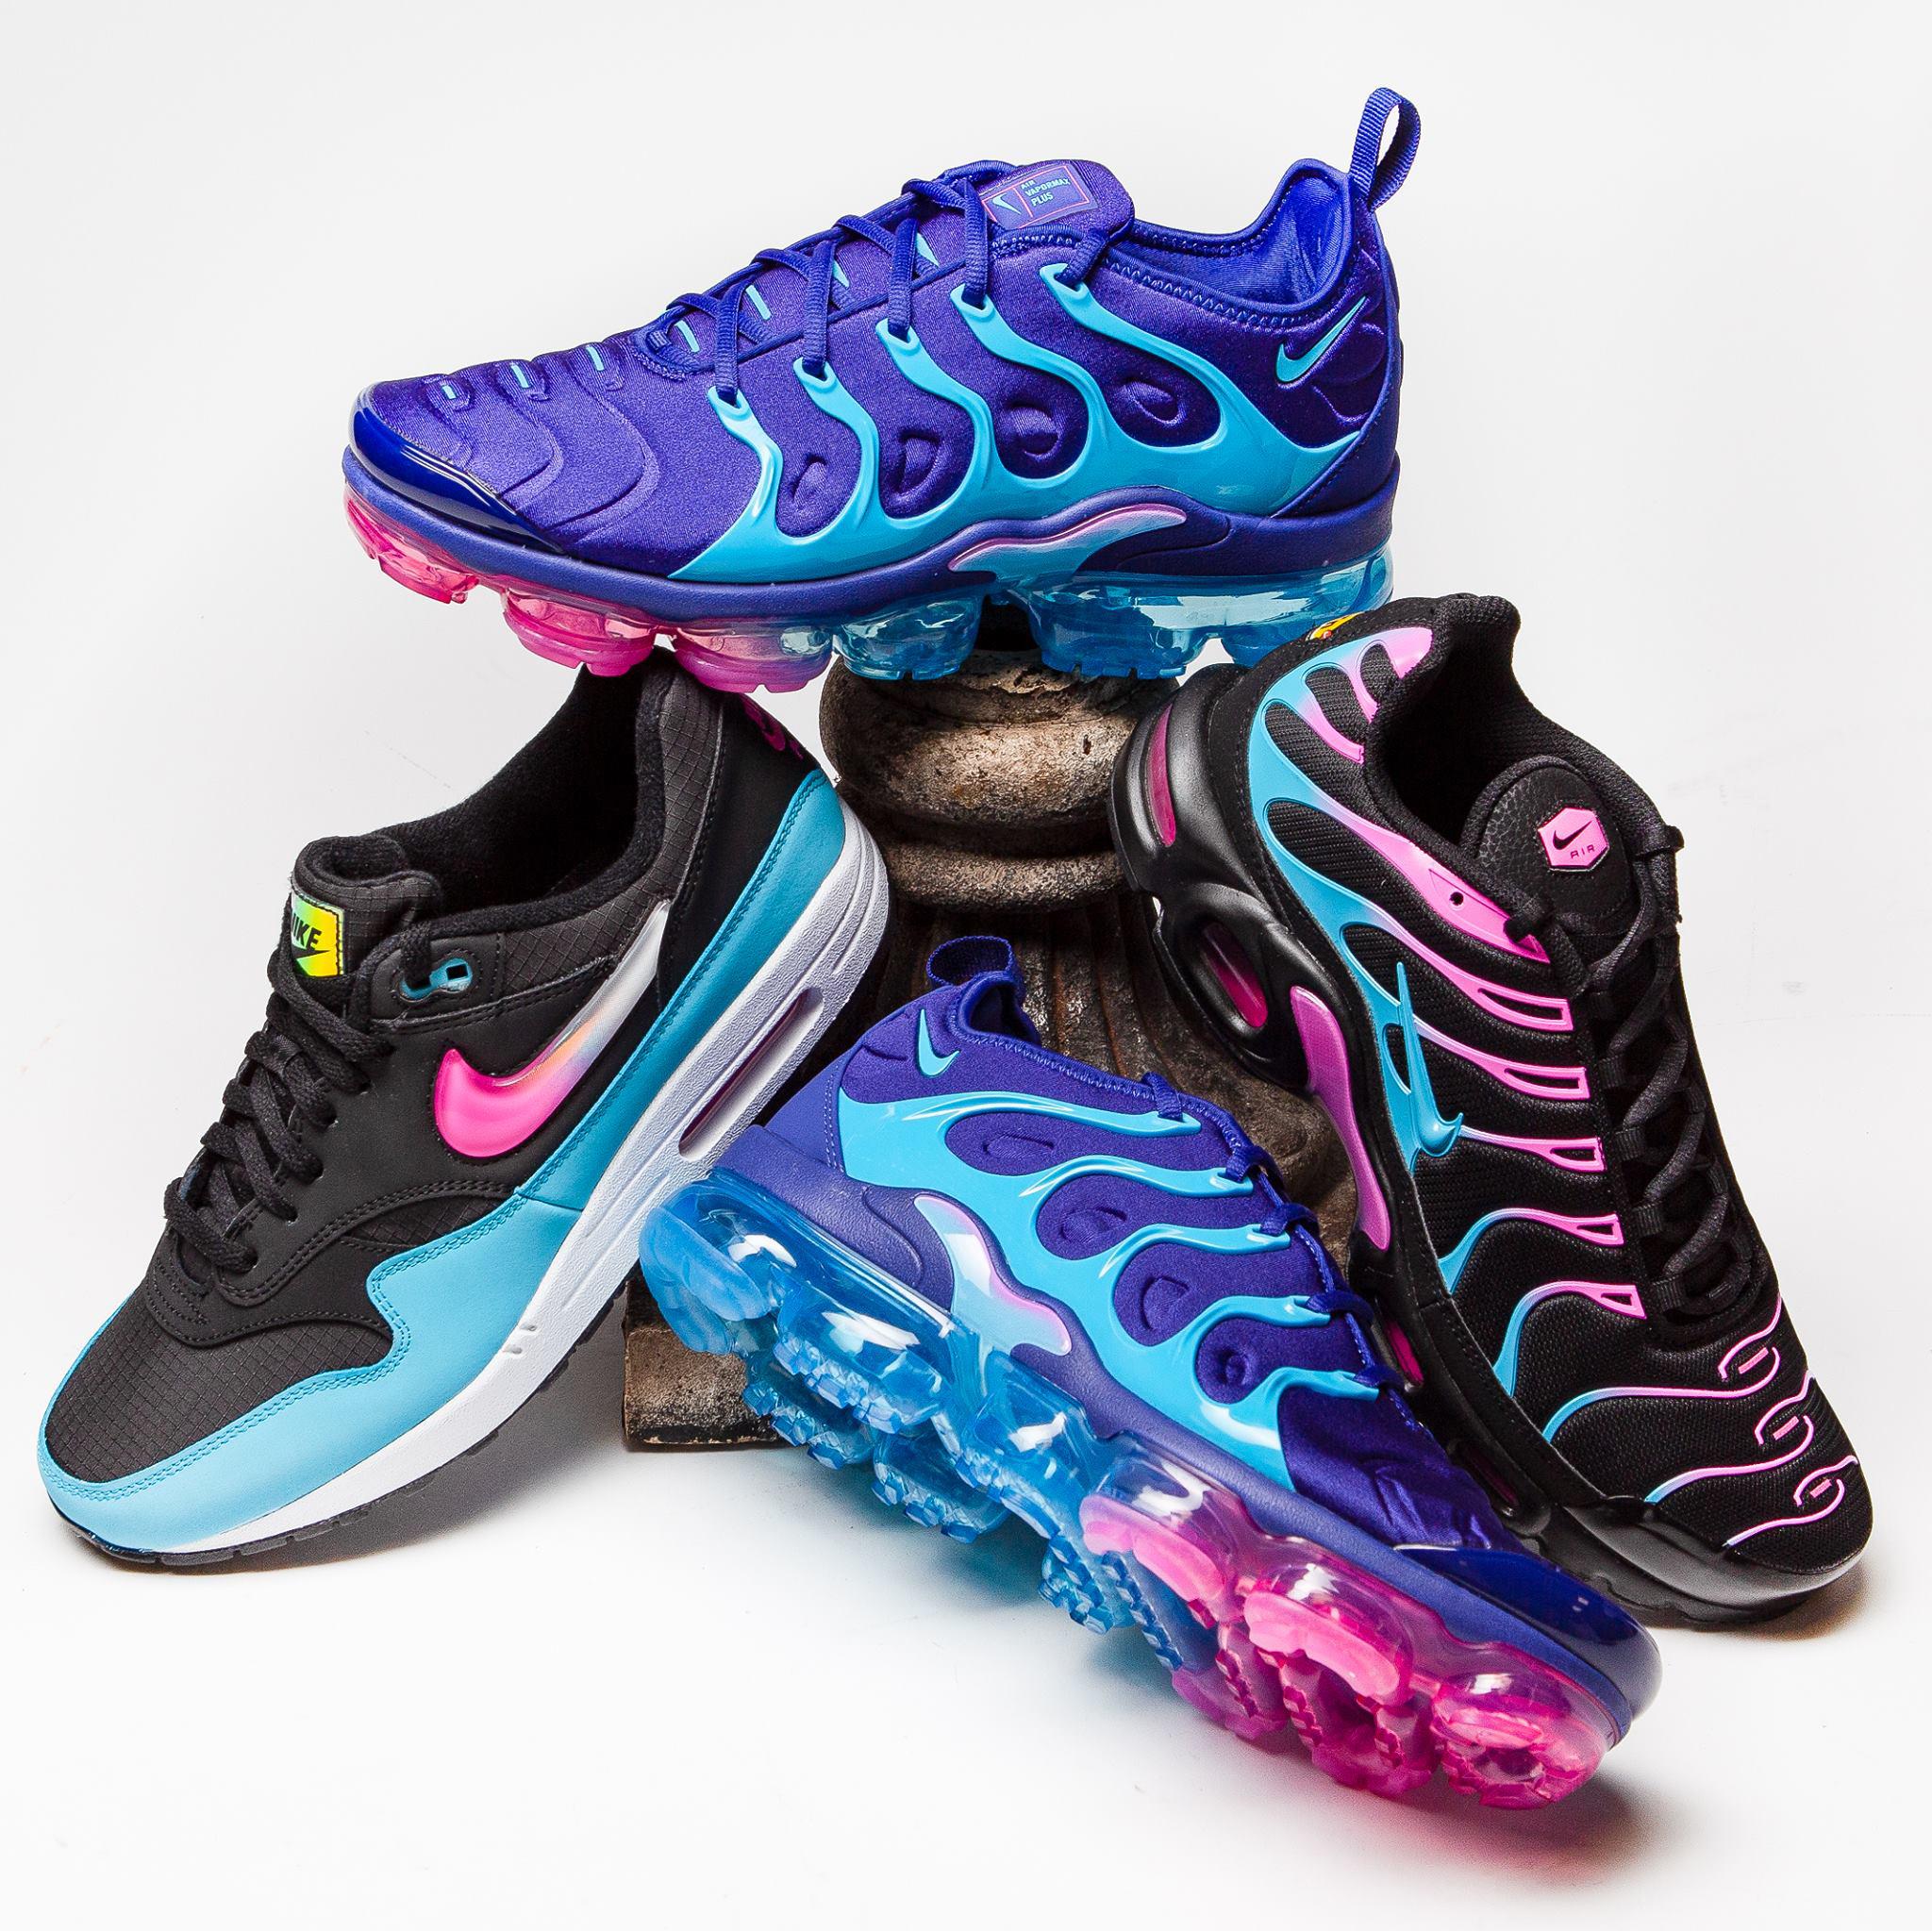 Nike Air Max City Brights Shoes and